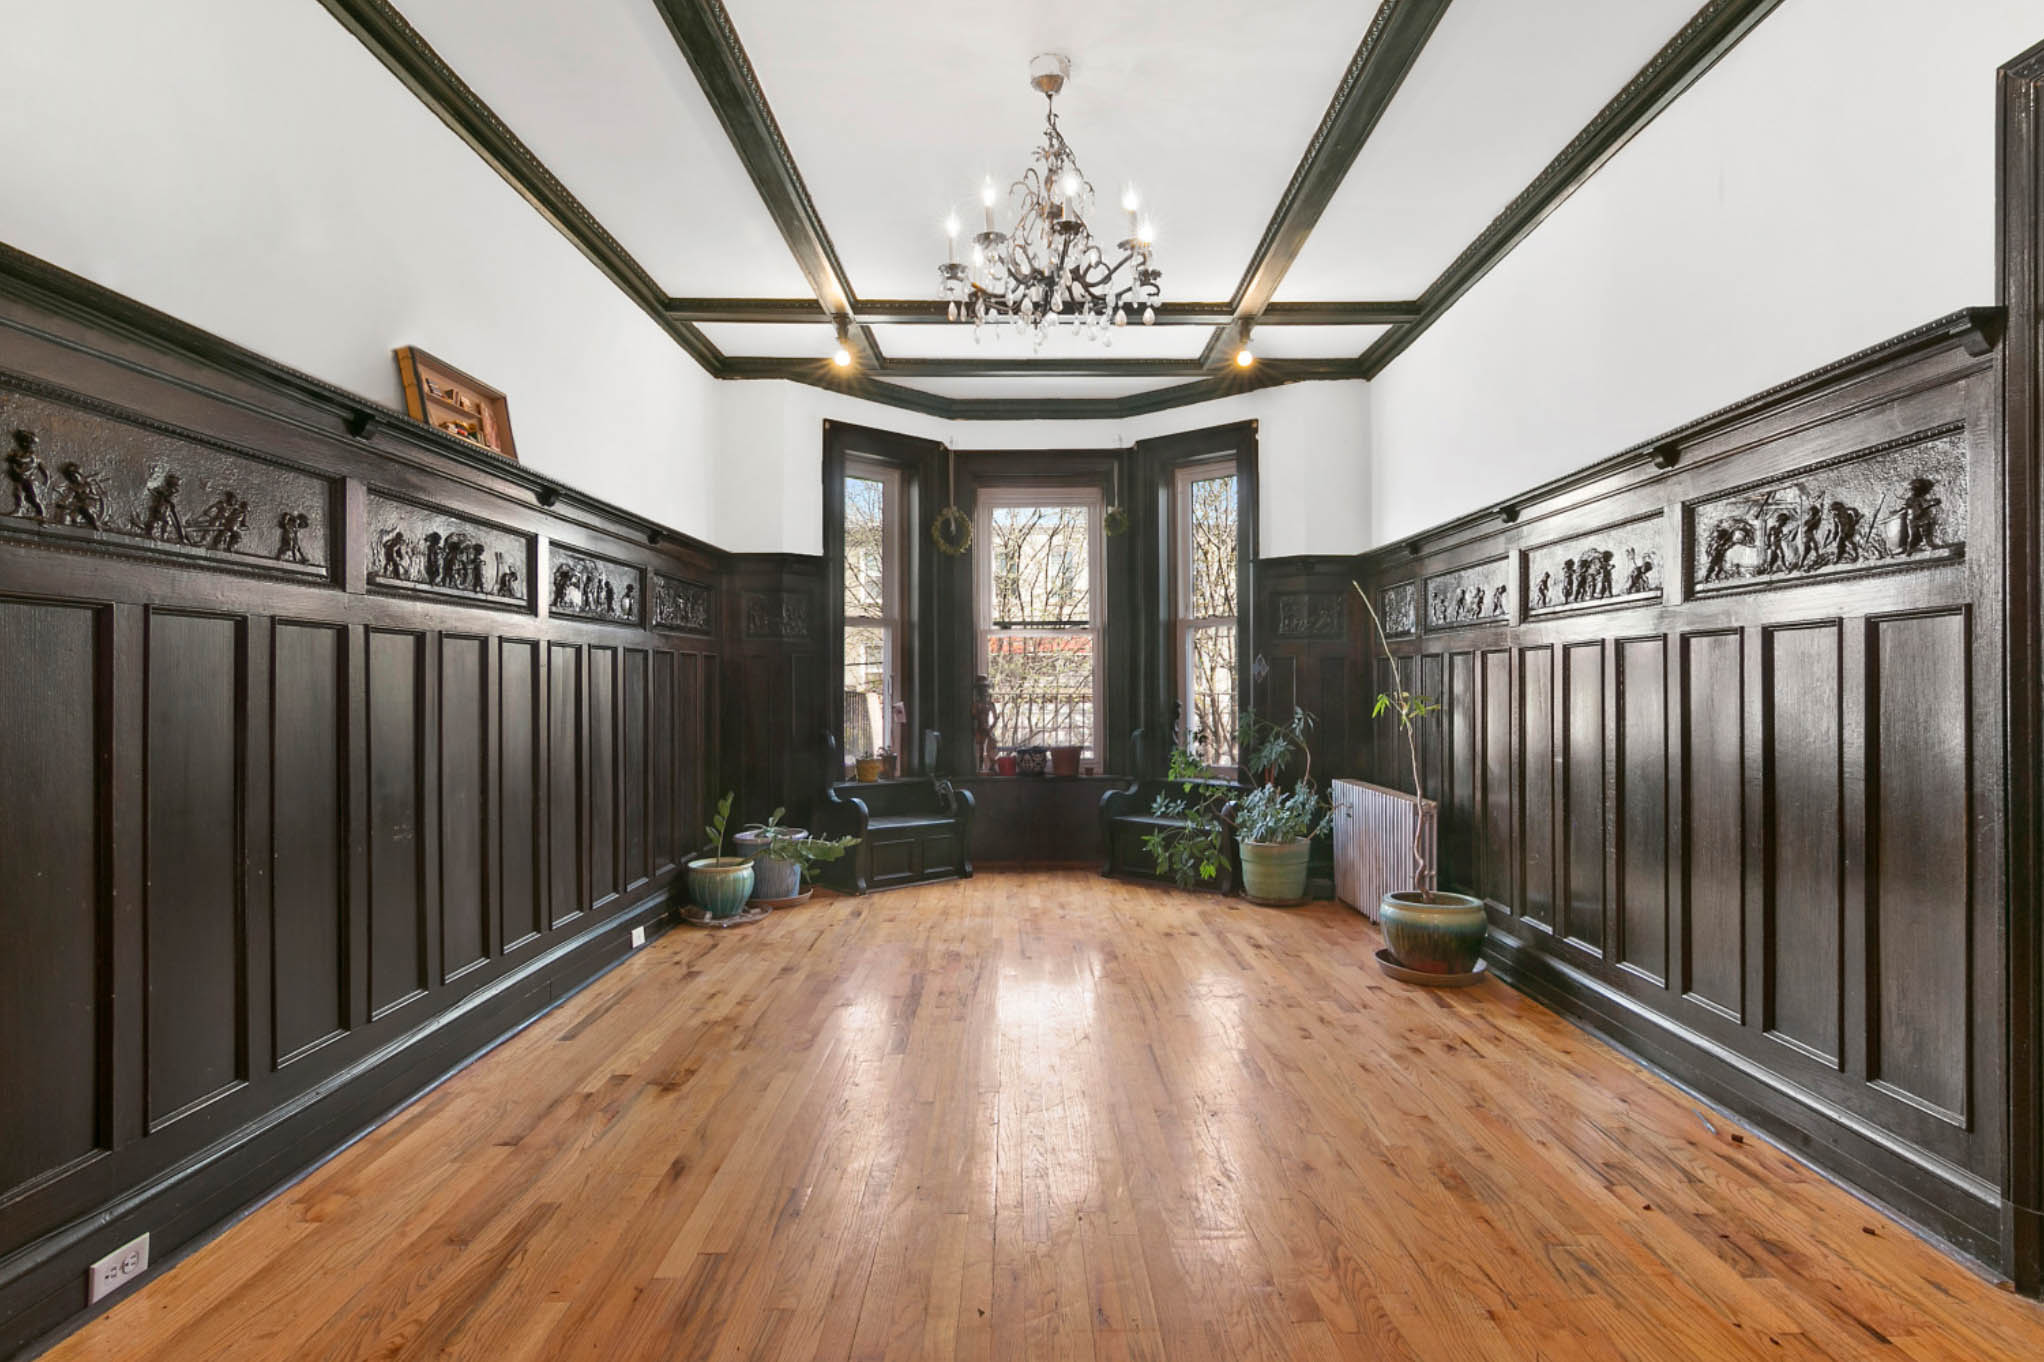 339 E25th Street - Flatbush | Brooklyn    4 Bedroom // 2 Bath Days on Market — 35 Sold Price:    $1,153,000*